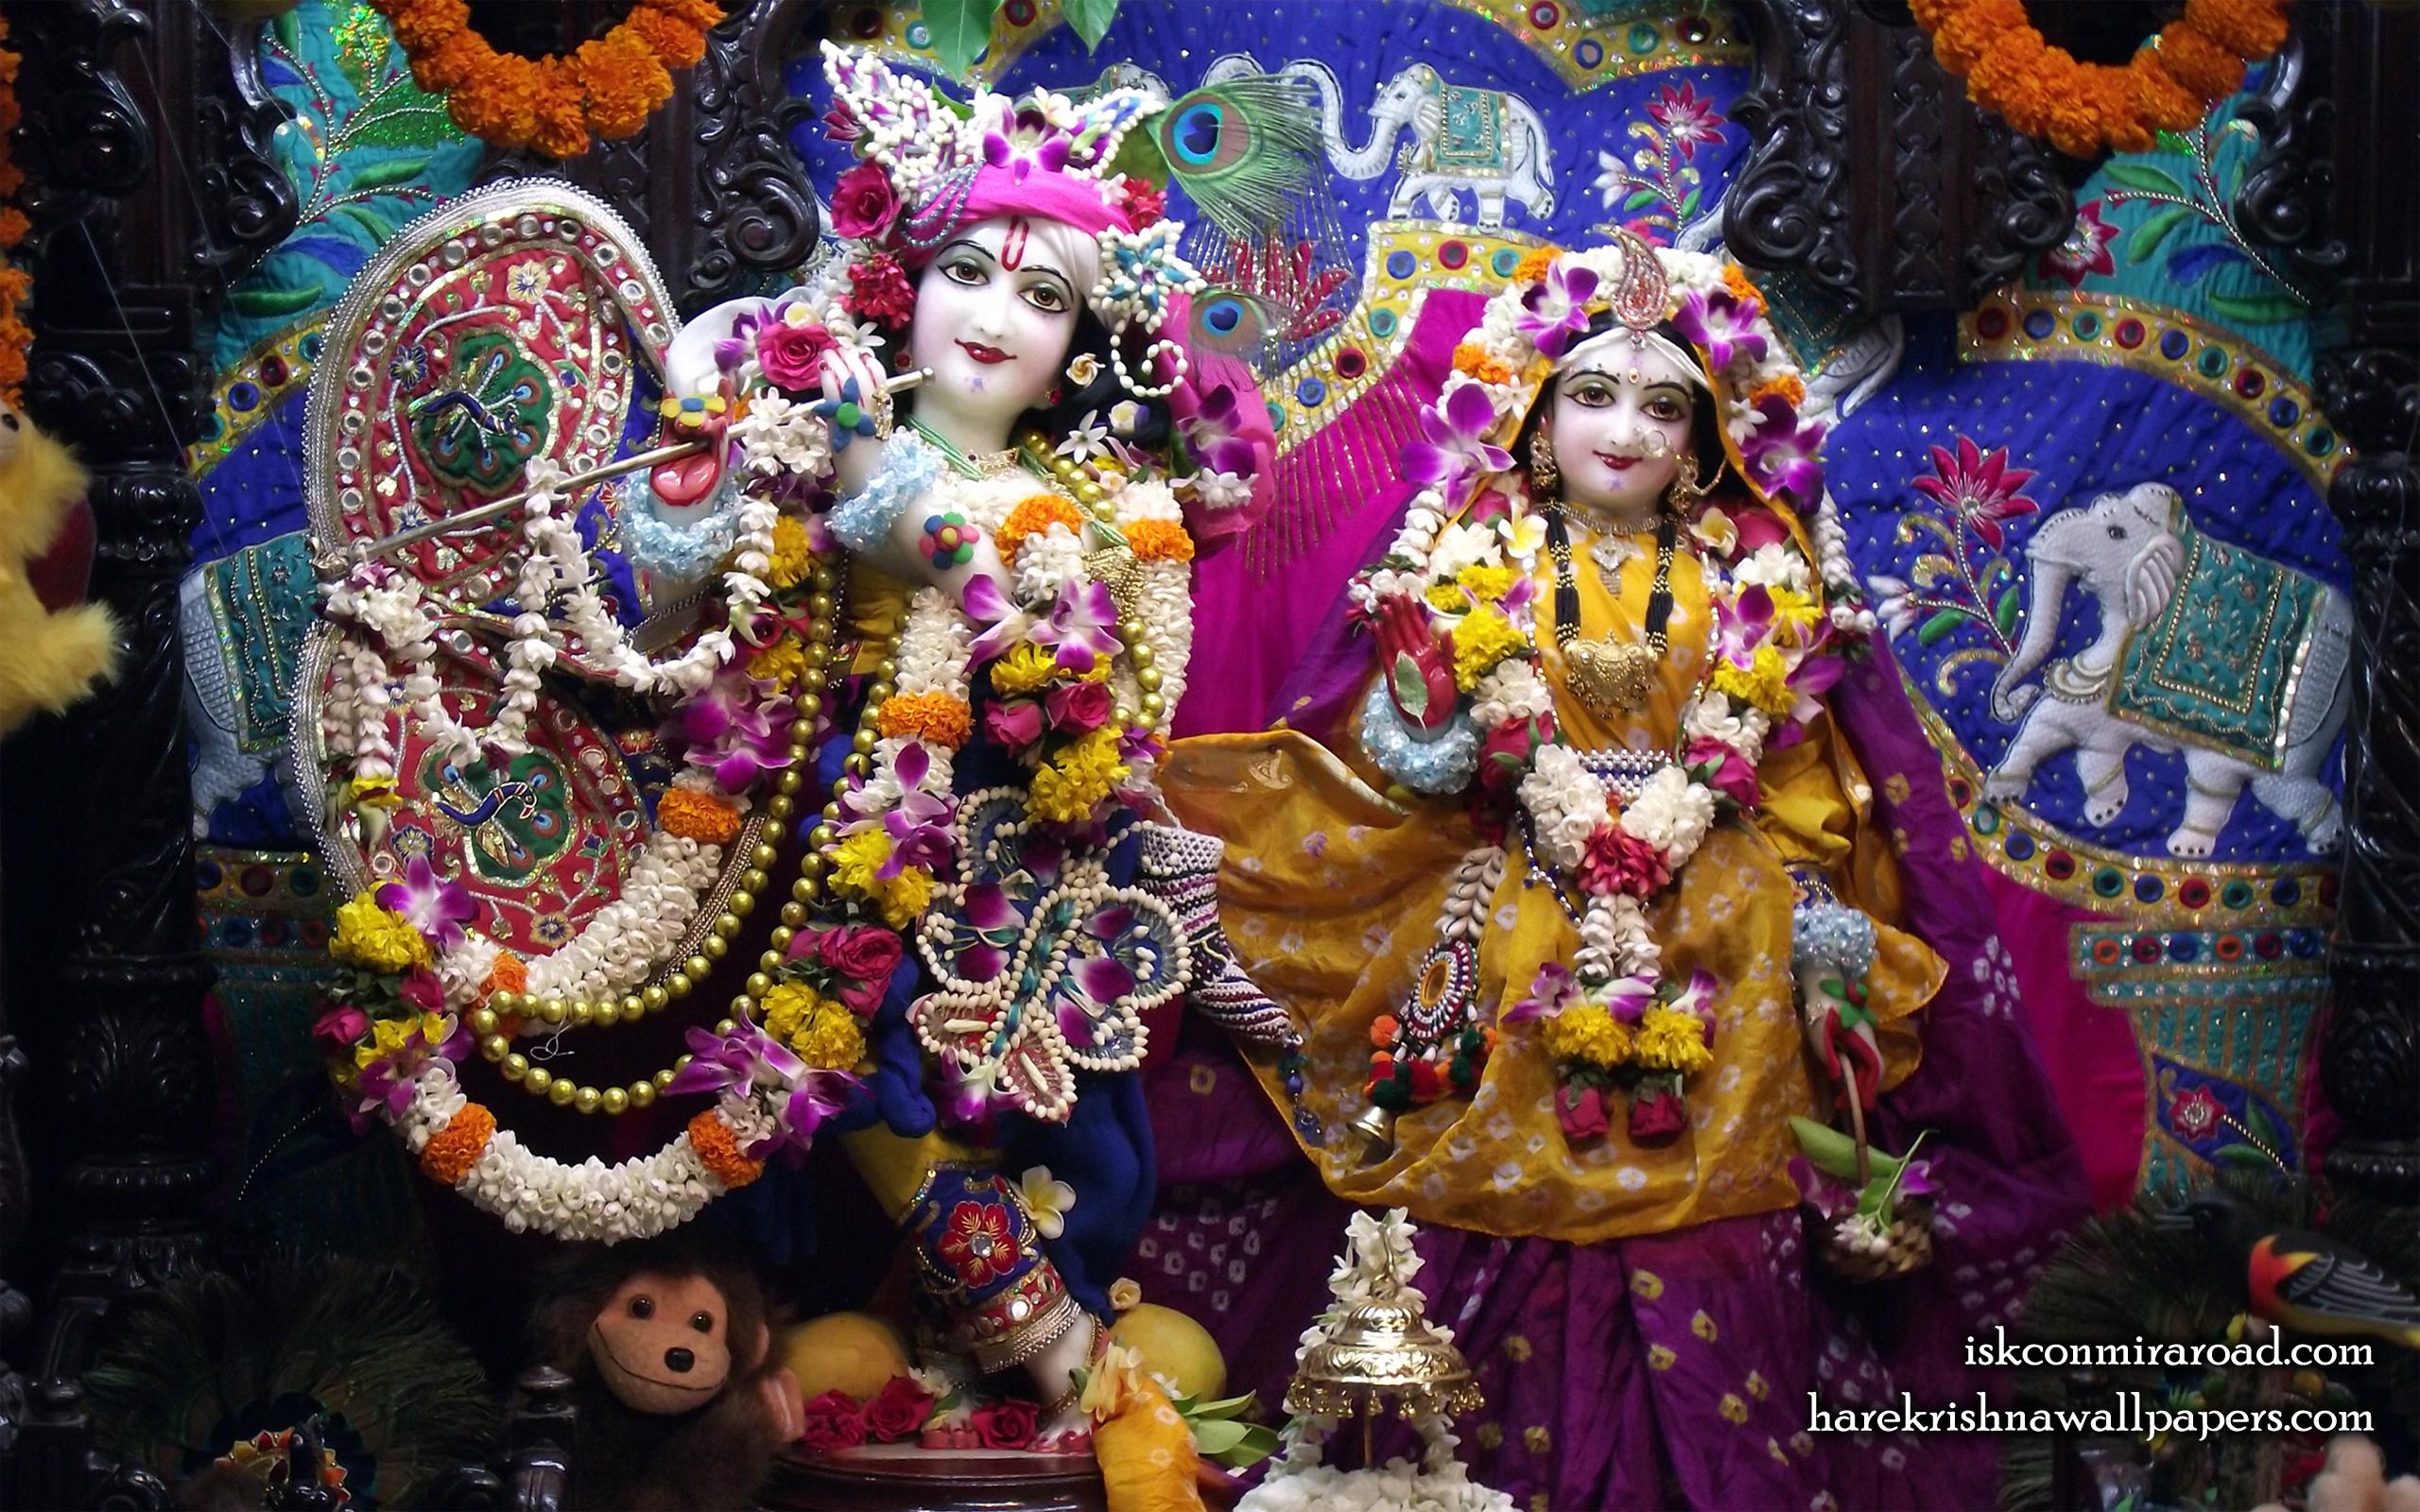 Sri Sri Radha Giridhari Wallpaper (013) Size 2560x1600 Download